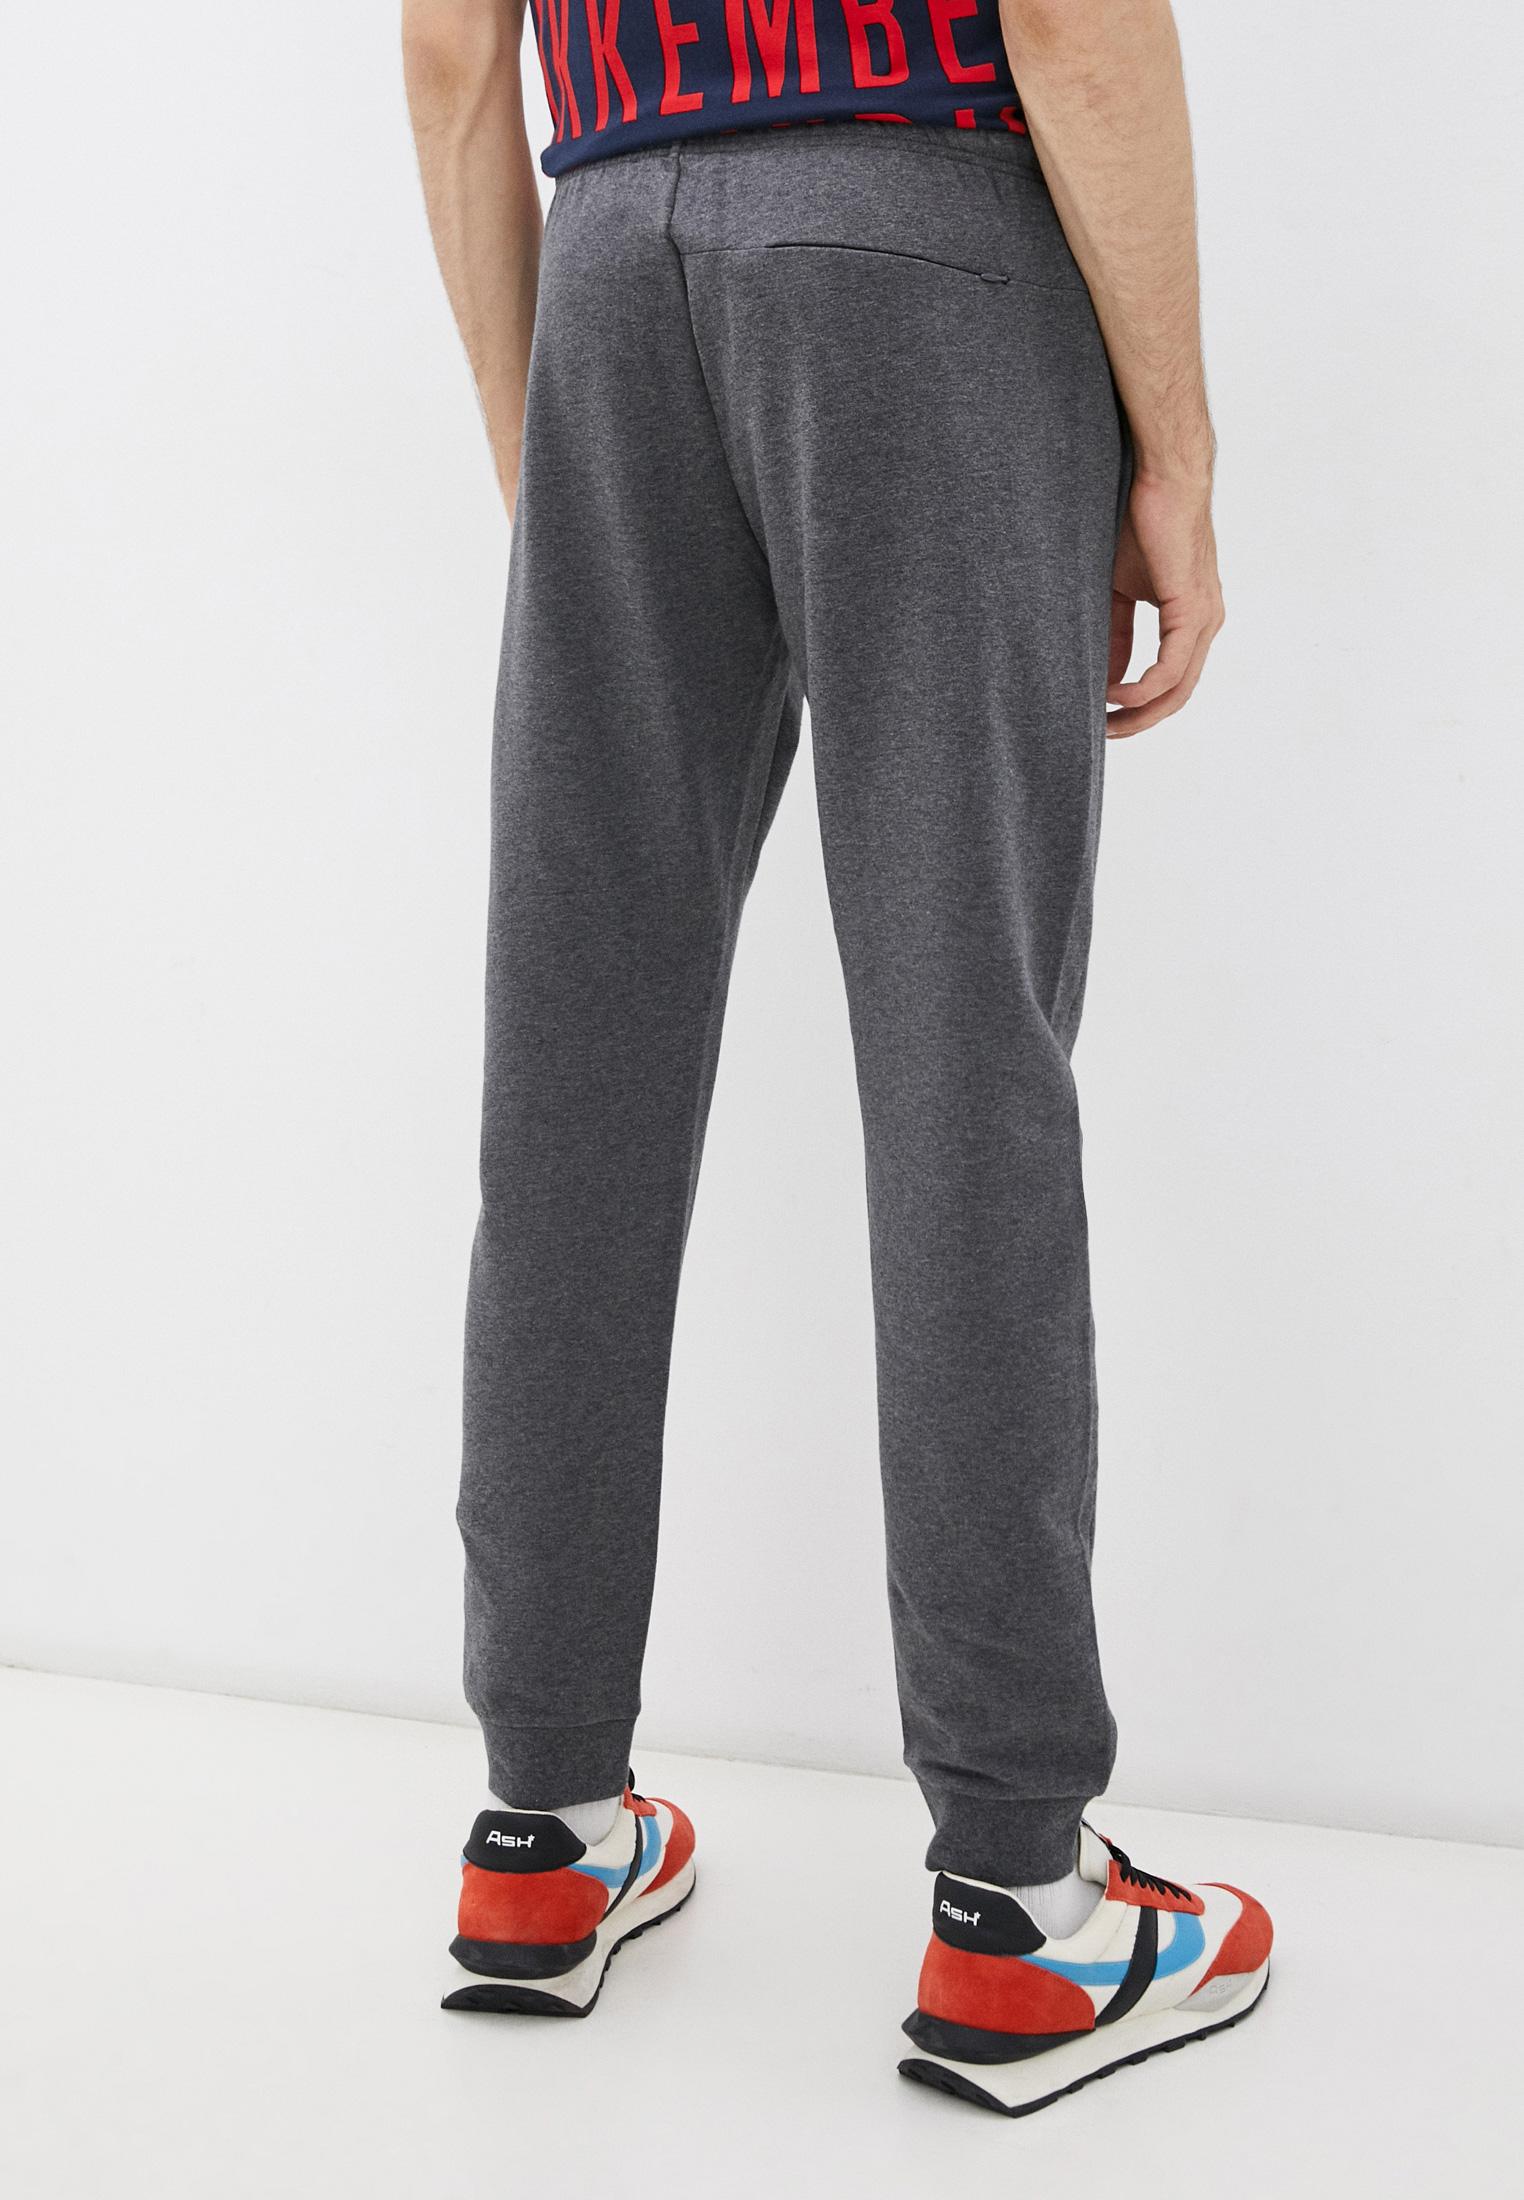 Мужские спортивные брюки Bikkembergs (Биккембергс) C 1 164 4T E 2191: изображение 4